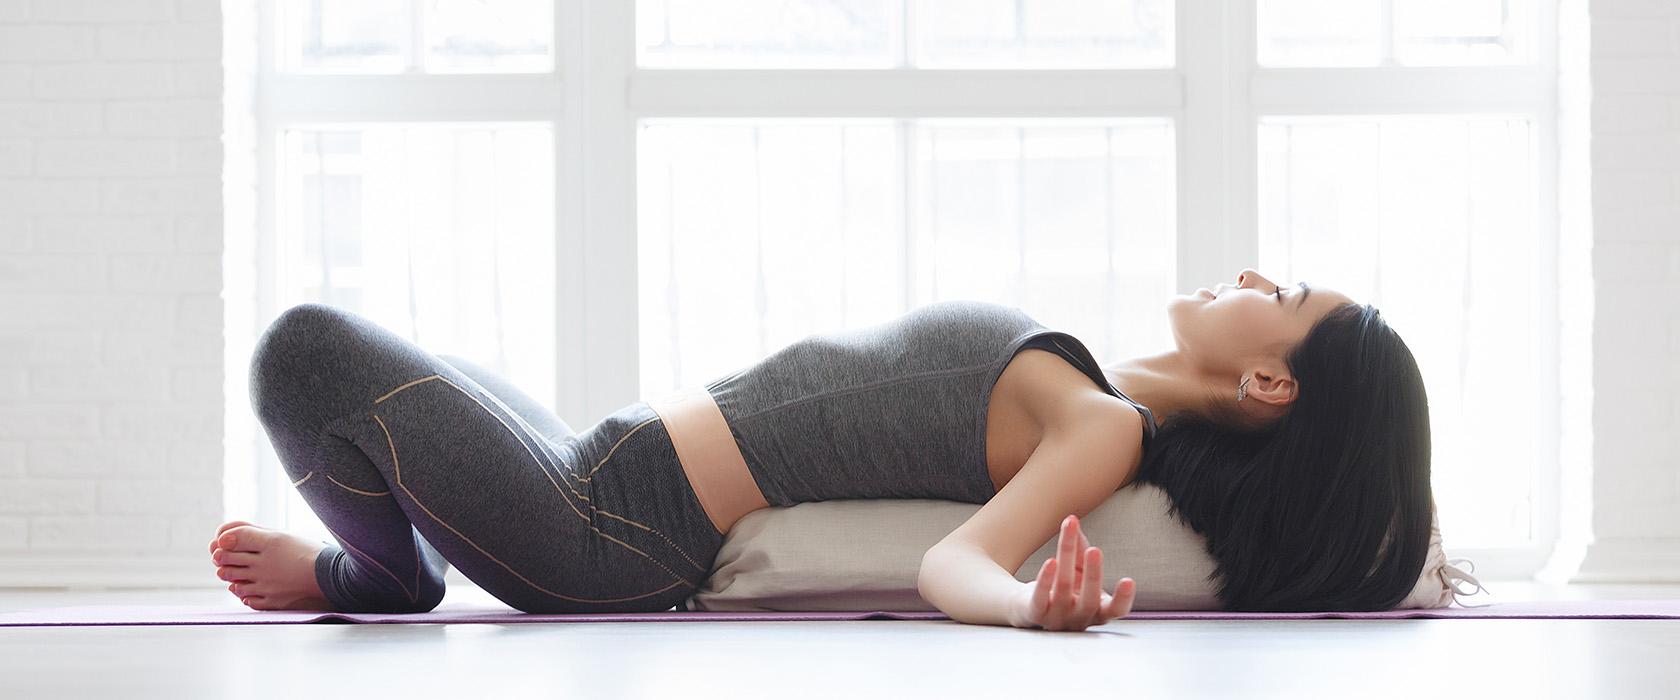 Хатха йога для начинающих видео уроки в домашних условиях